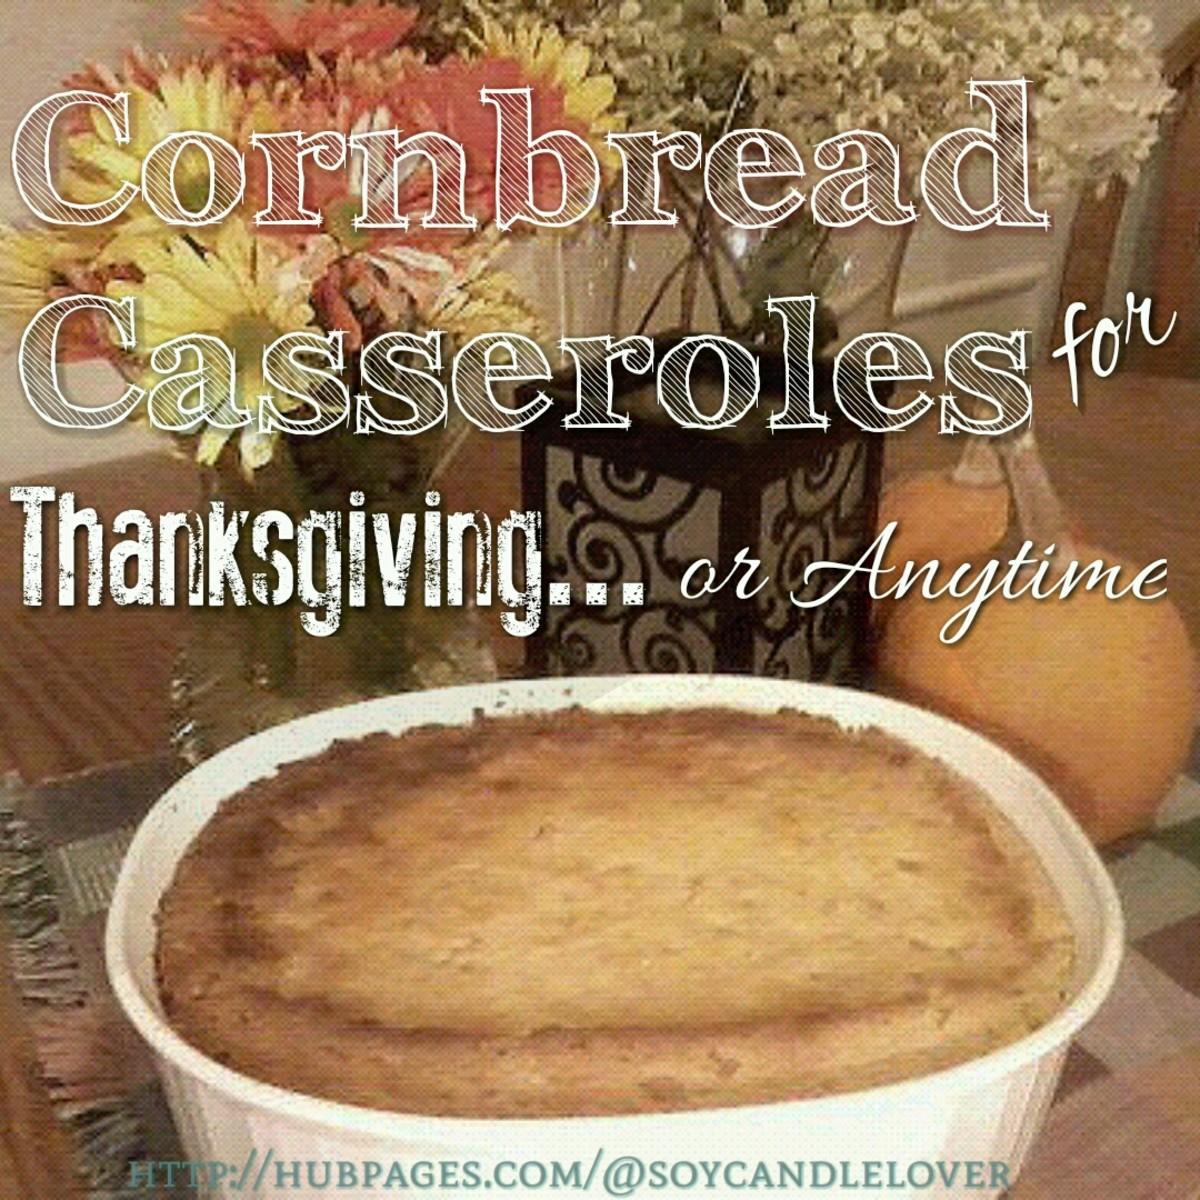 cornbread-casseroles